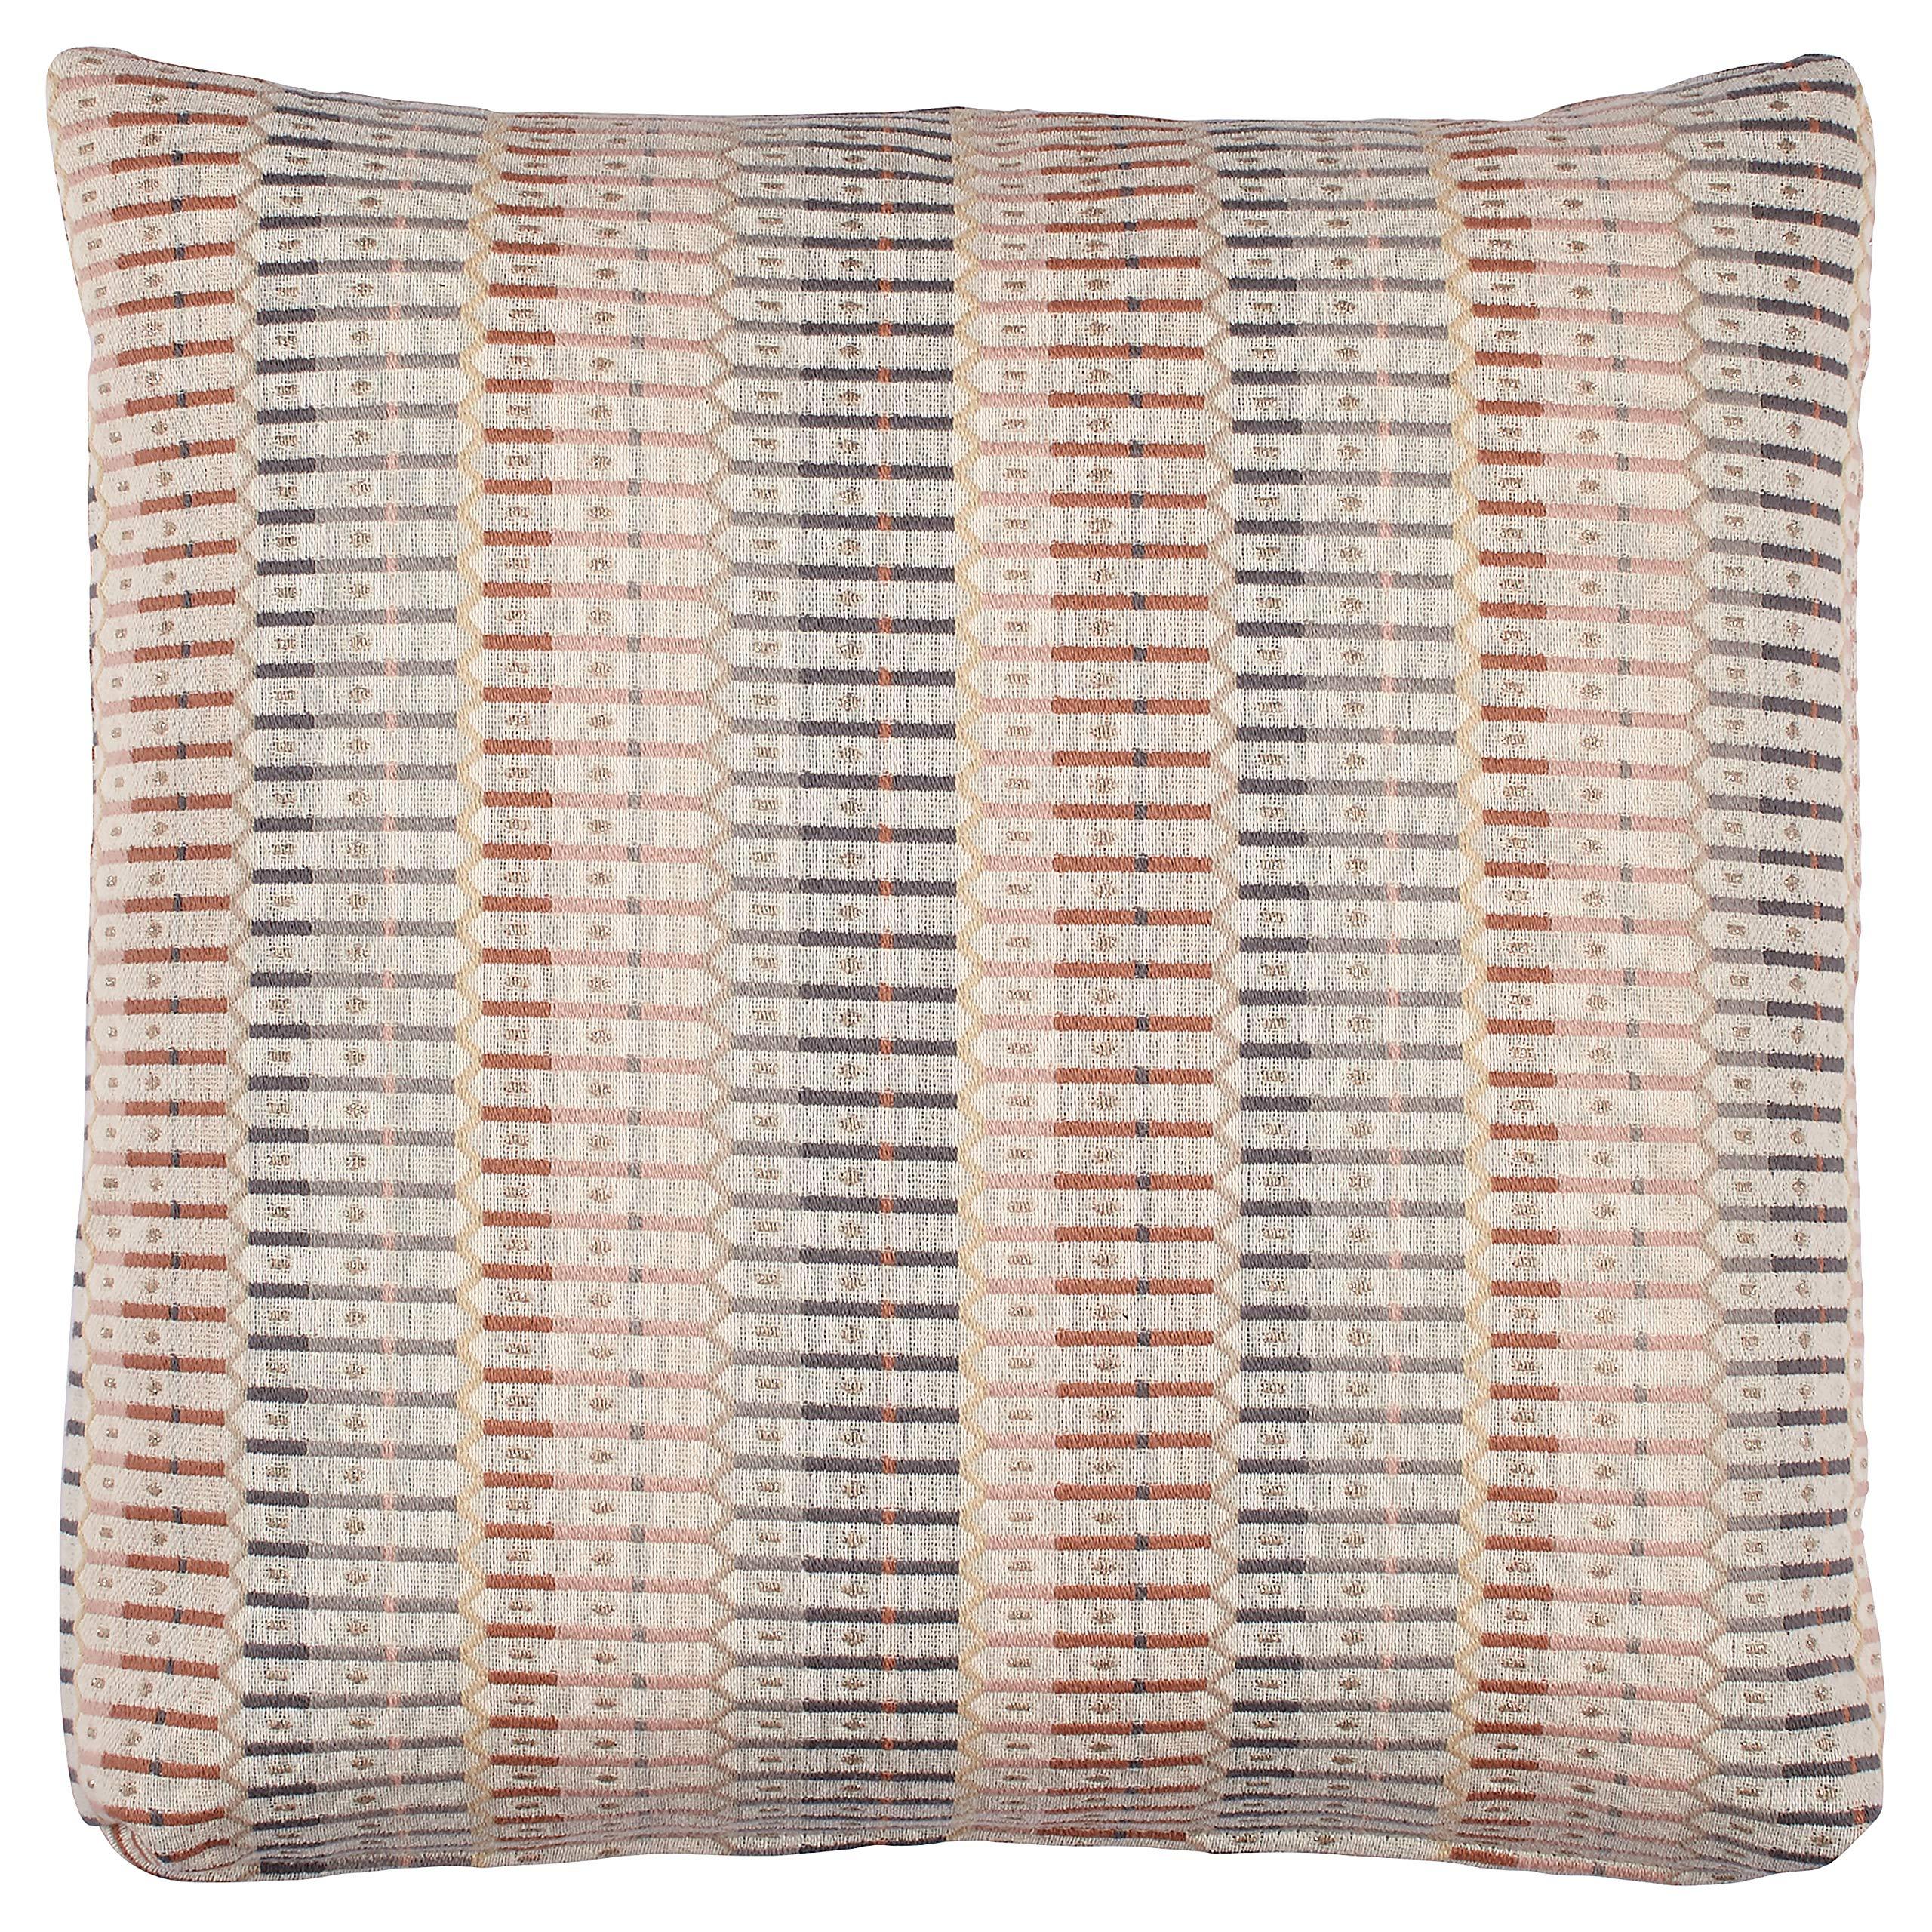 Stone & Beam Transitional Geometric Weave Pillow, 19'', Blush by Stone & Beam